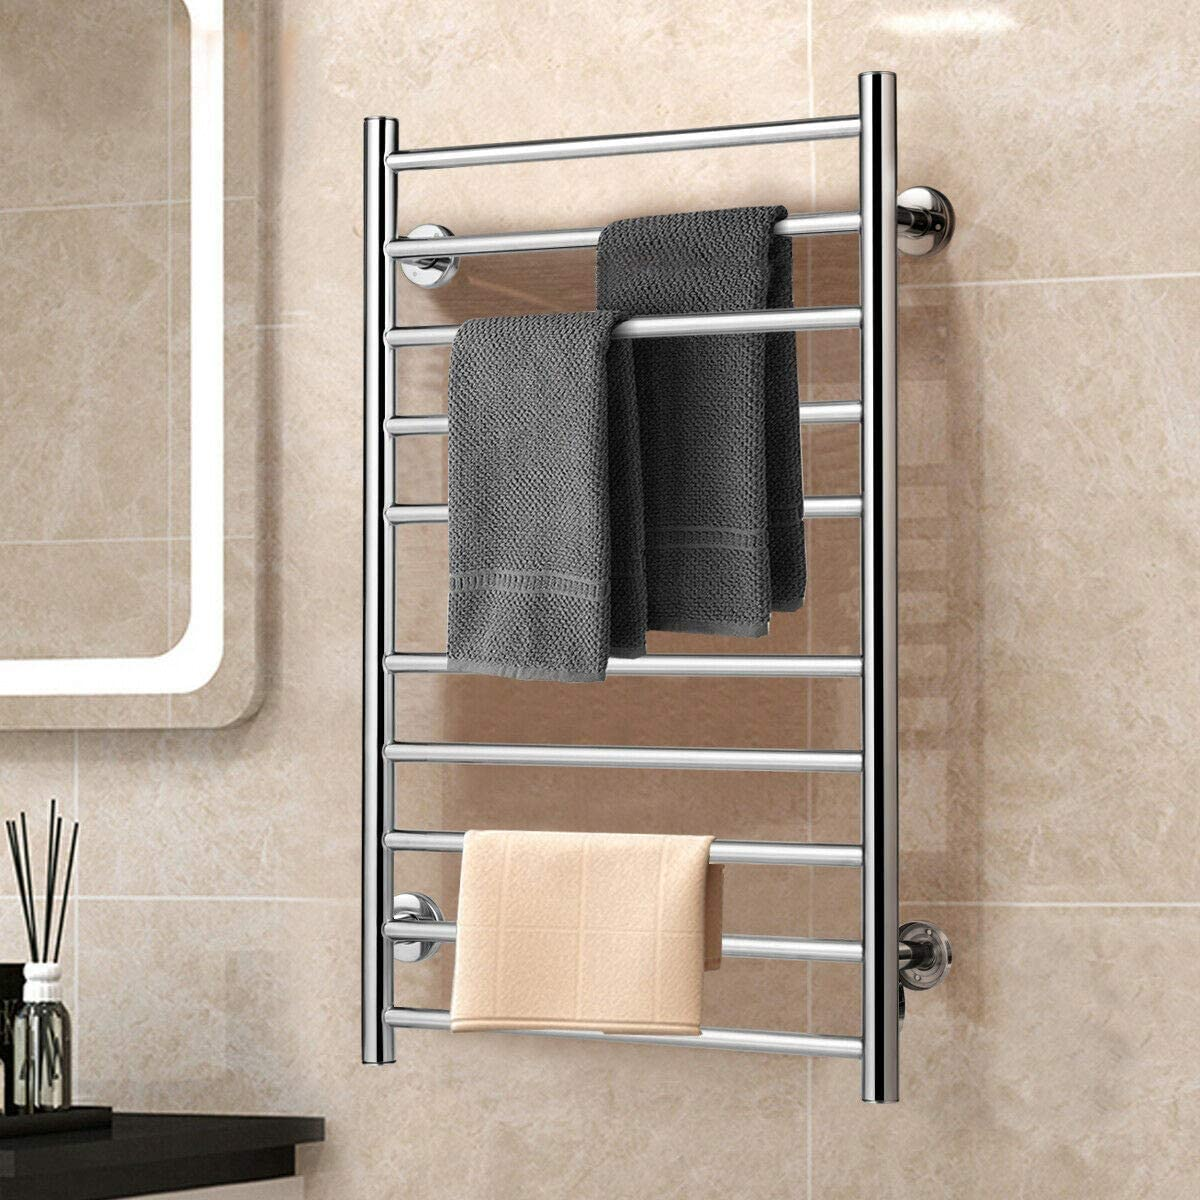 BestComfort Wall Mounted Heated Towel Warmer, 10 Bars Stainless Steel Polished Towel Warmer Drying Rack